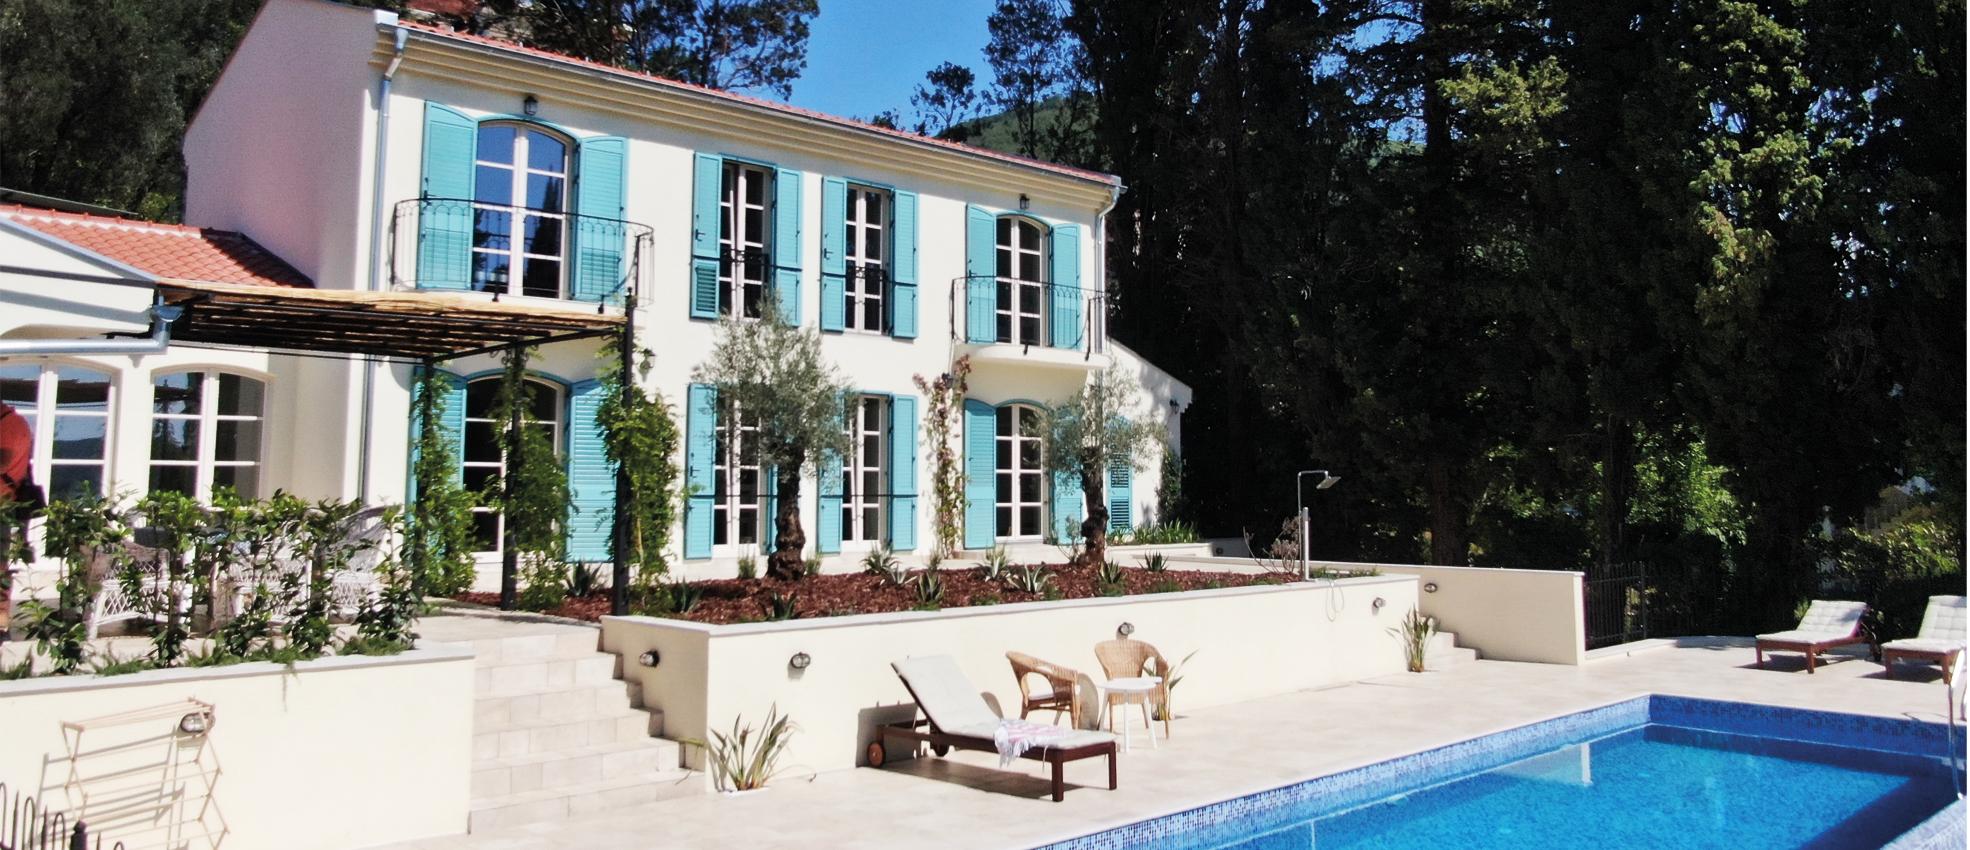 Elegantna vila izuzetnog kvaliteta u blizini Herceg Novog